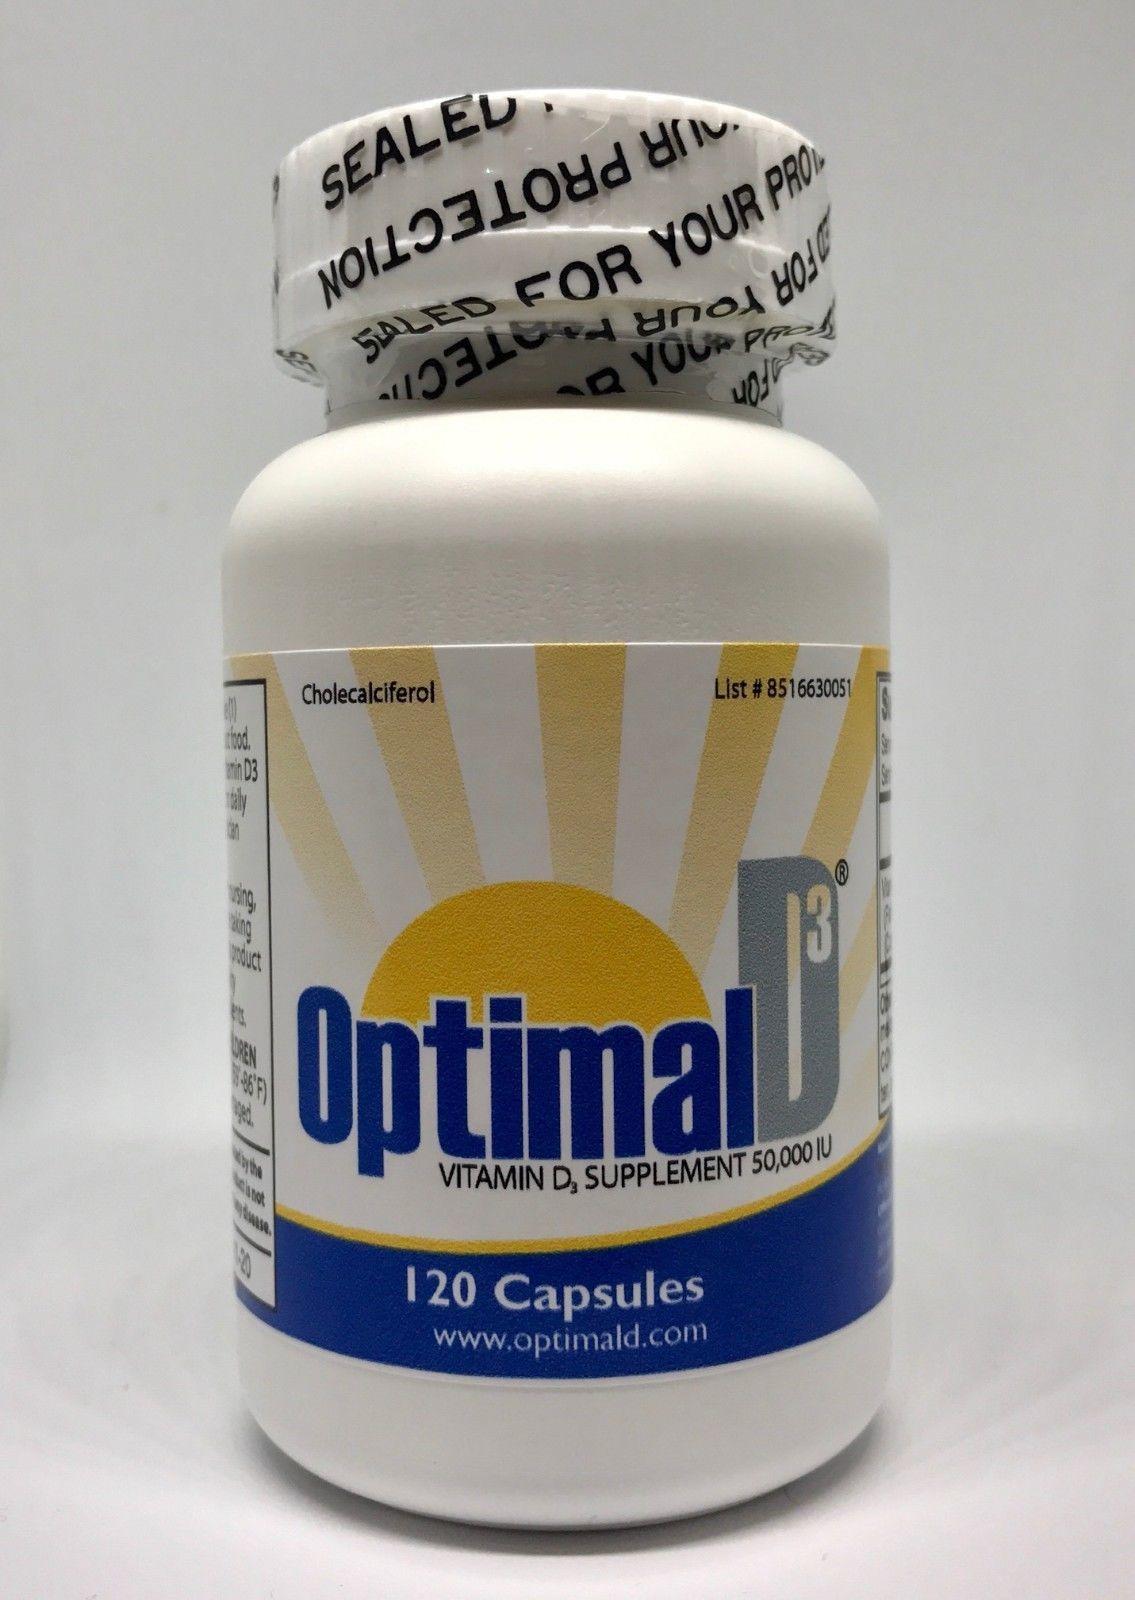 Optimal D3 Vitamin D3 50000 Iu 120 Capsules Exp 11 2020 Free Shipping Vitamins Vitamin D3 Health And Beauty